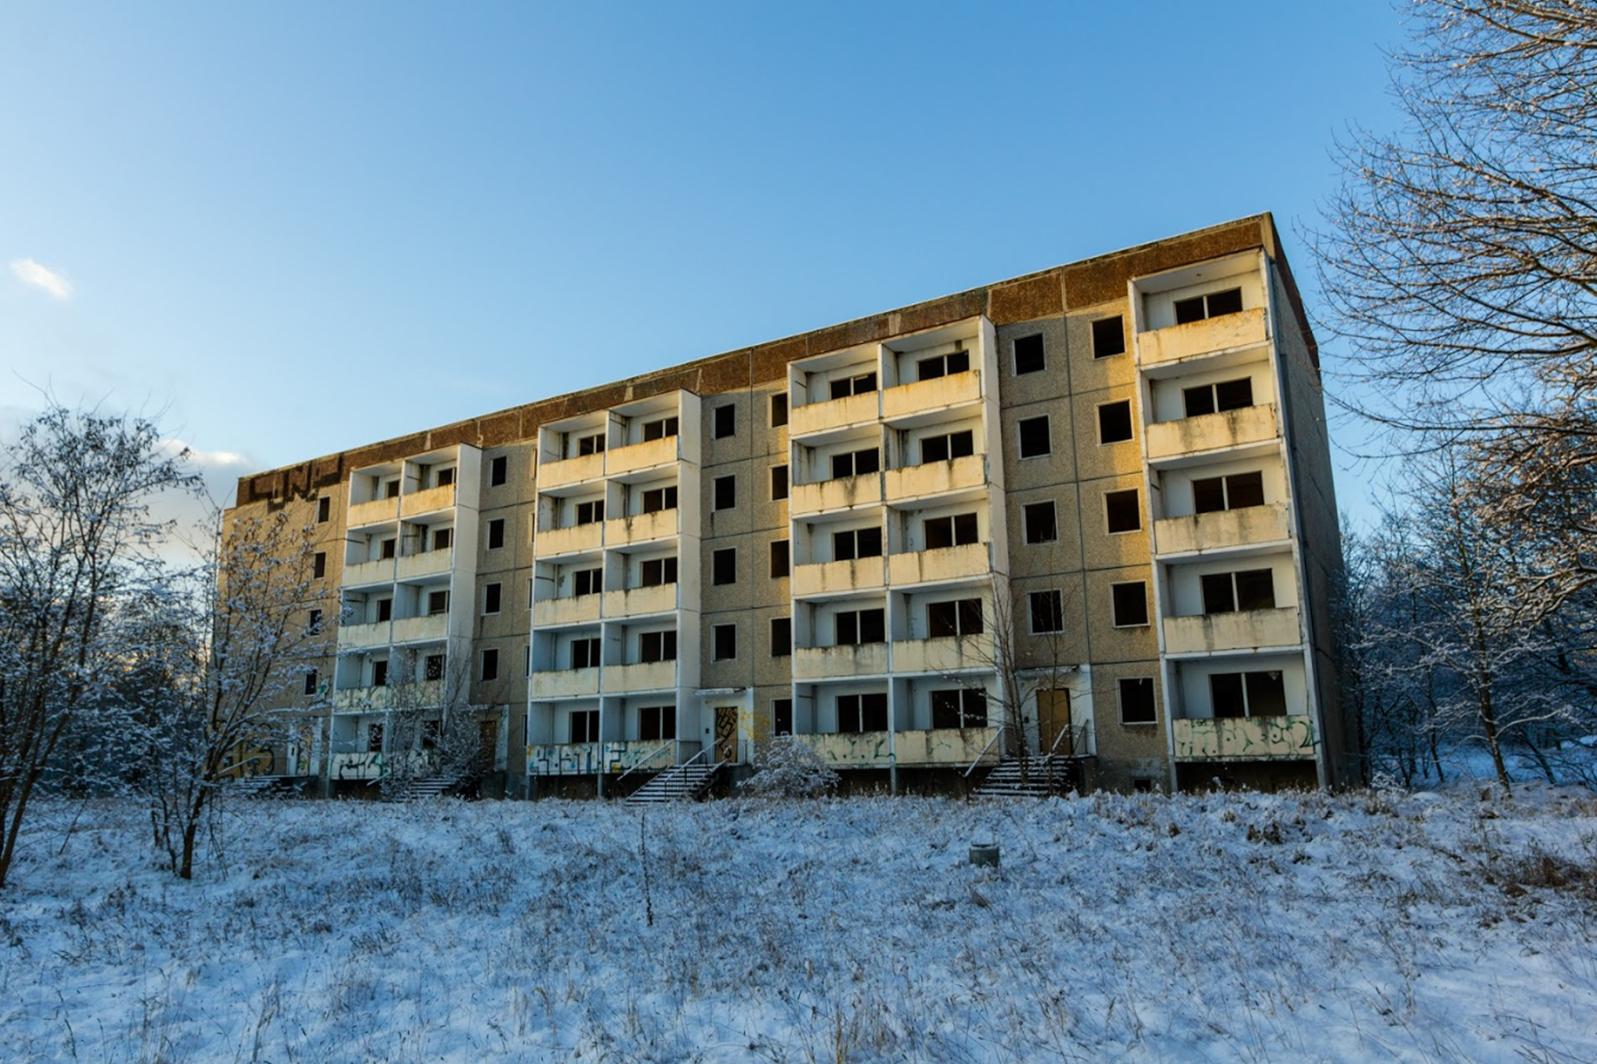 Berlin village abandon urbex 1936 - Berlin, Sarajevo, Athènes : les sites des Jeux Olympiques version urbex